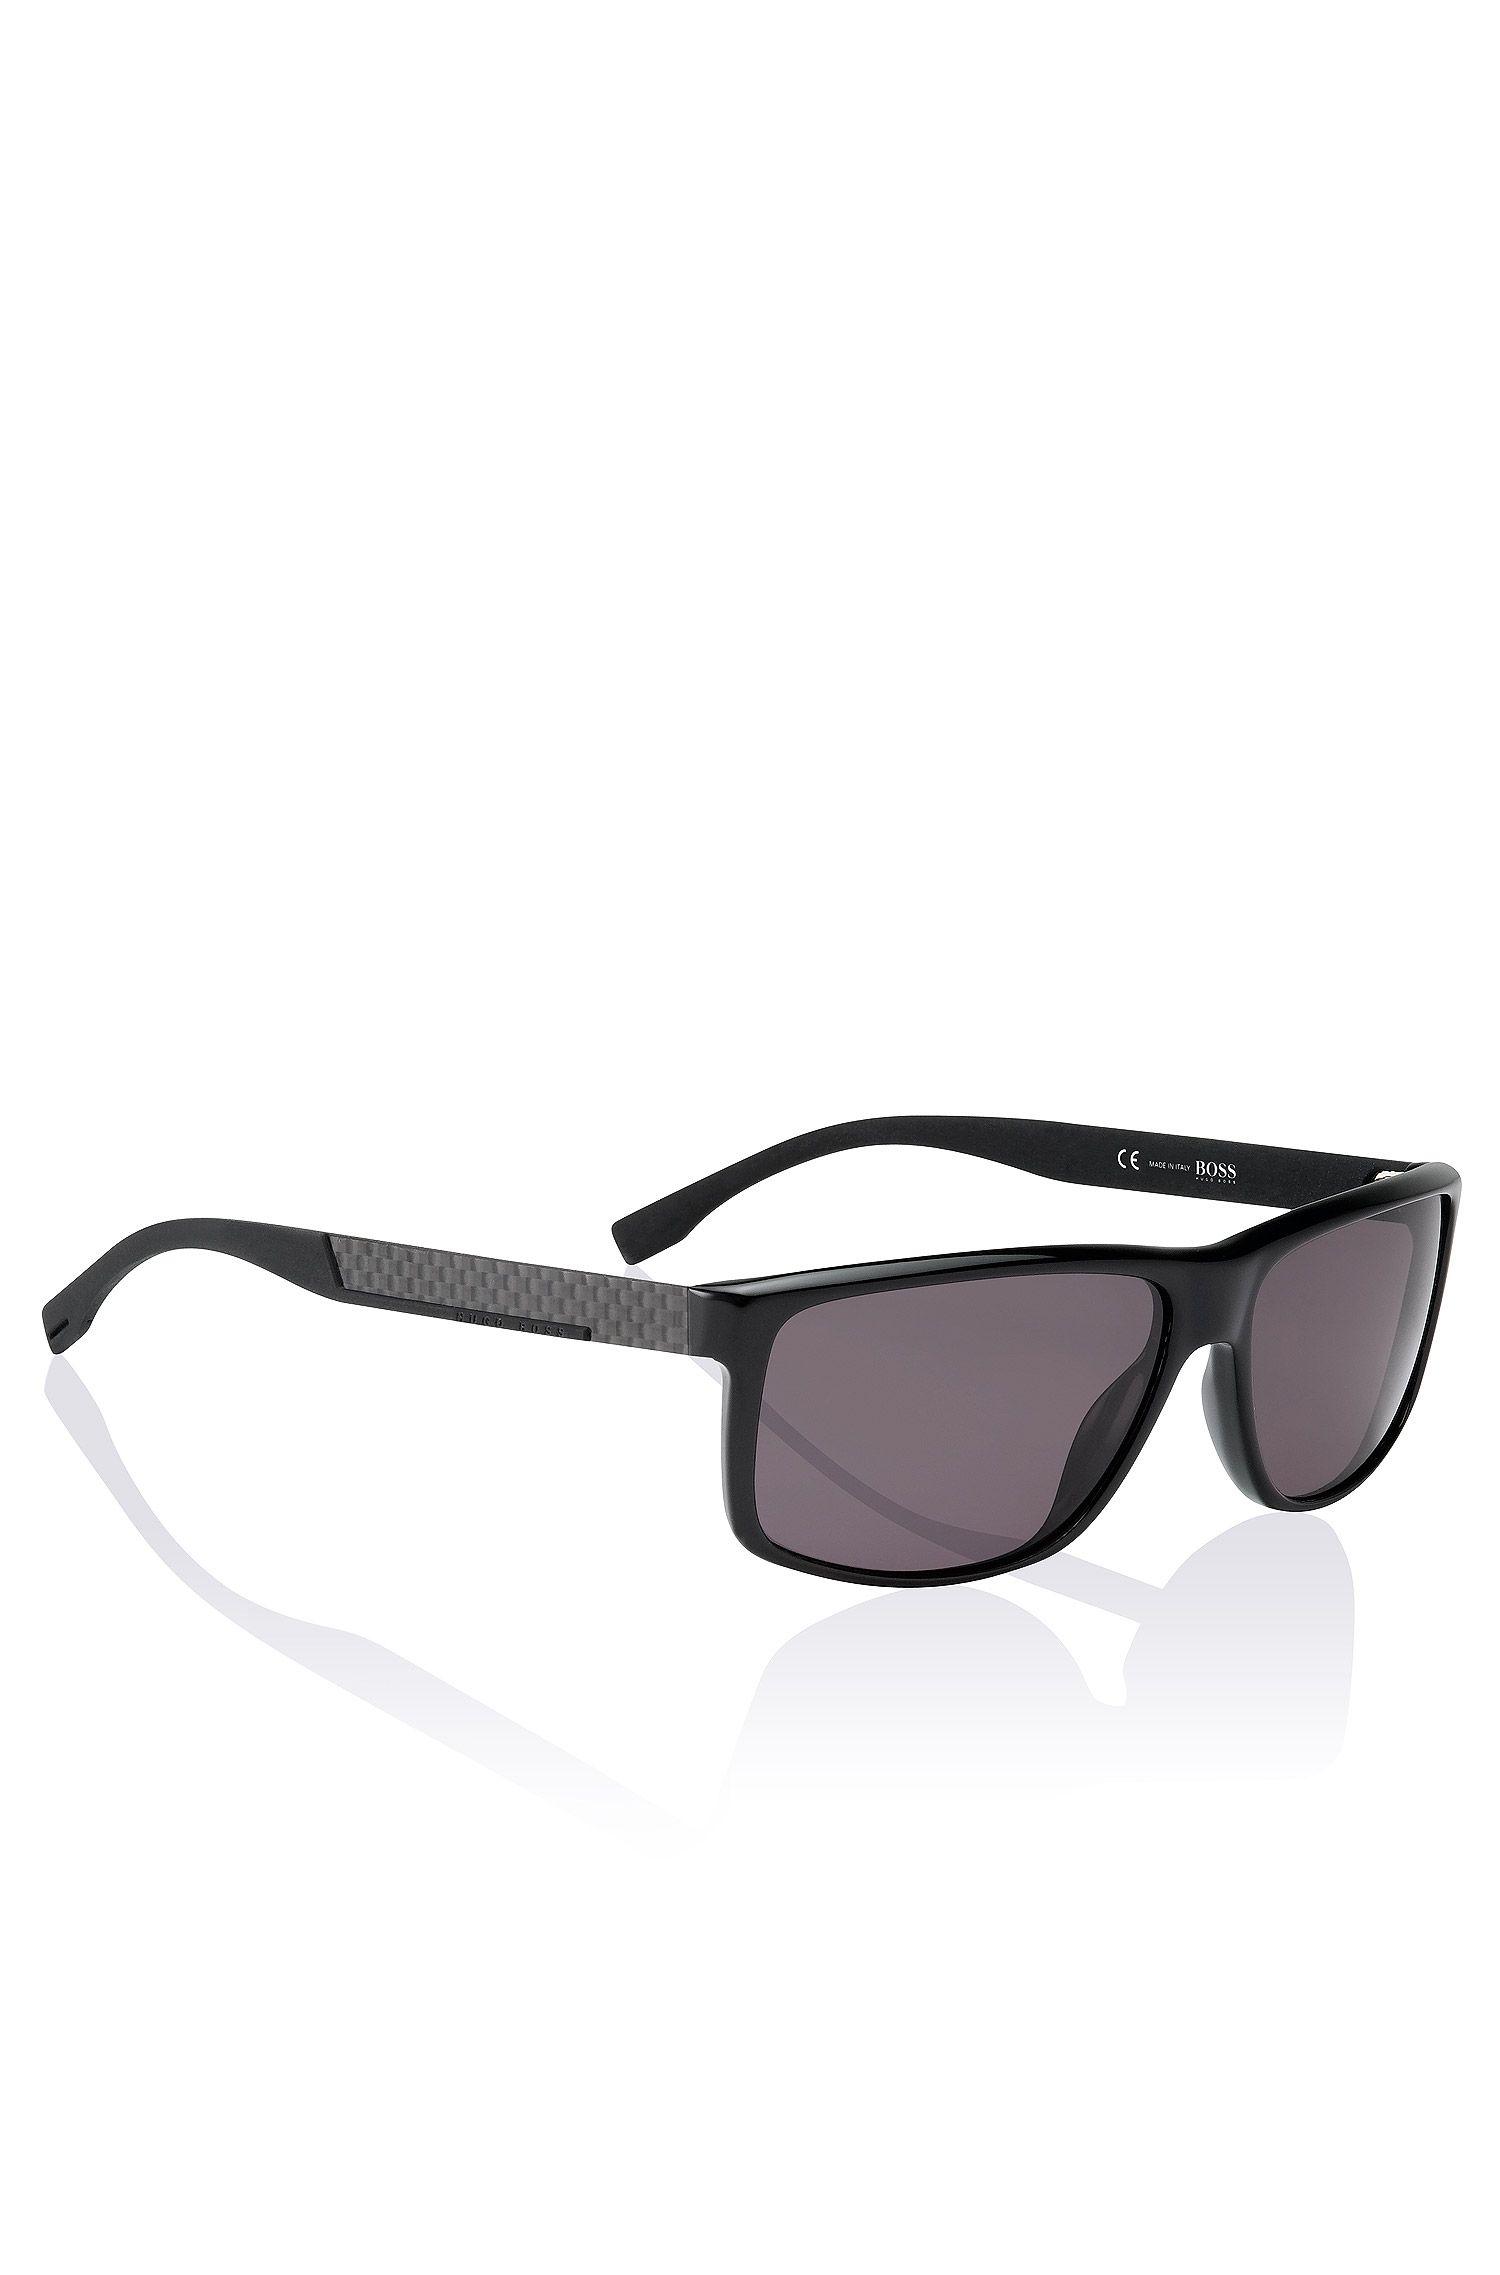 Gafas de sol 'BOSS 637/S'